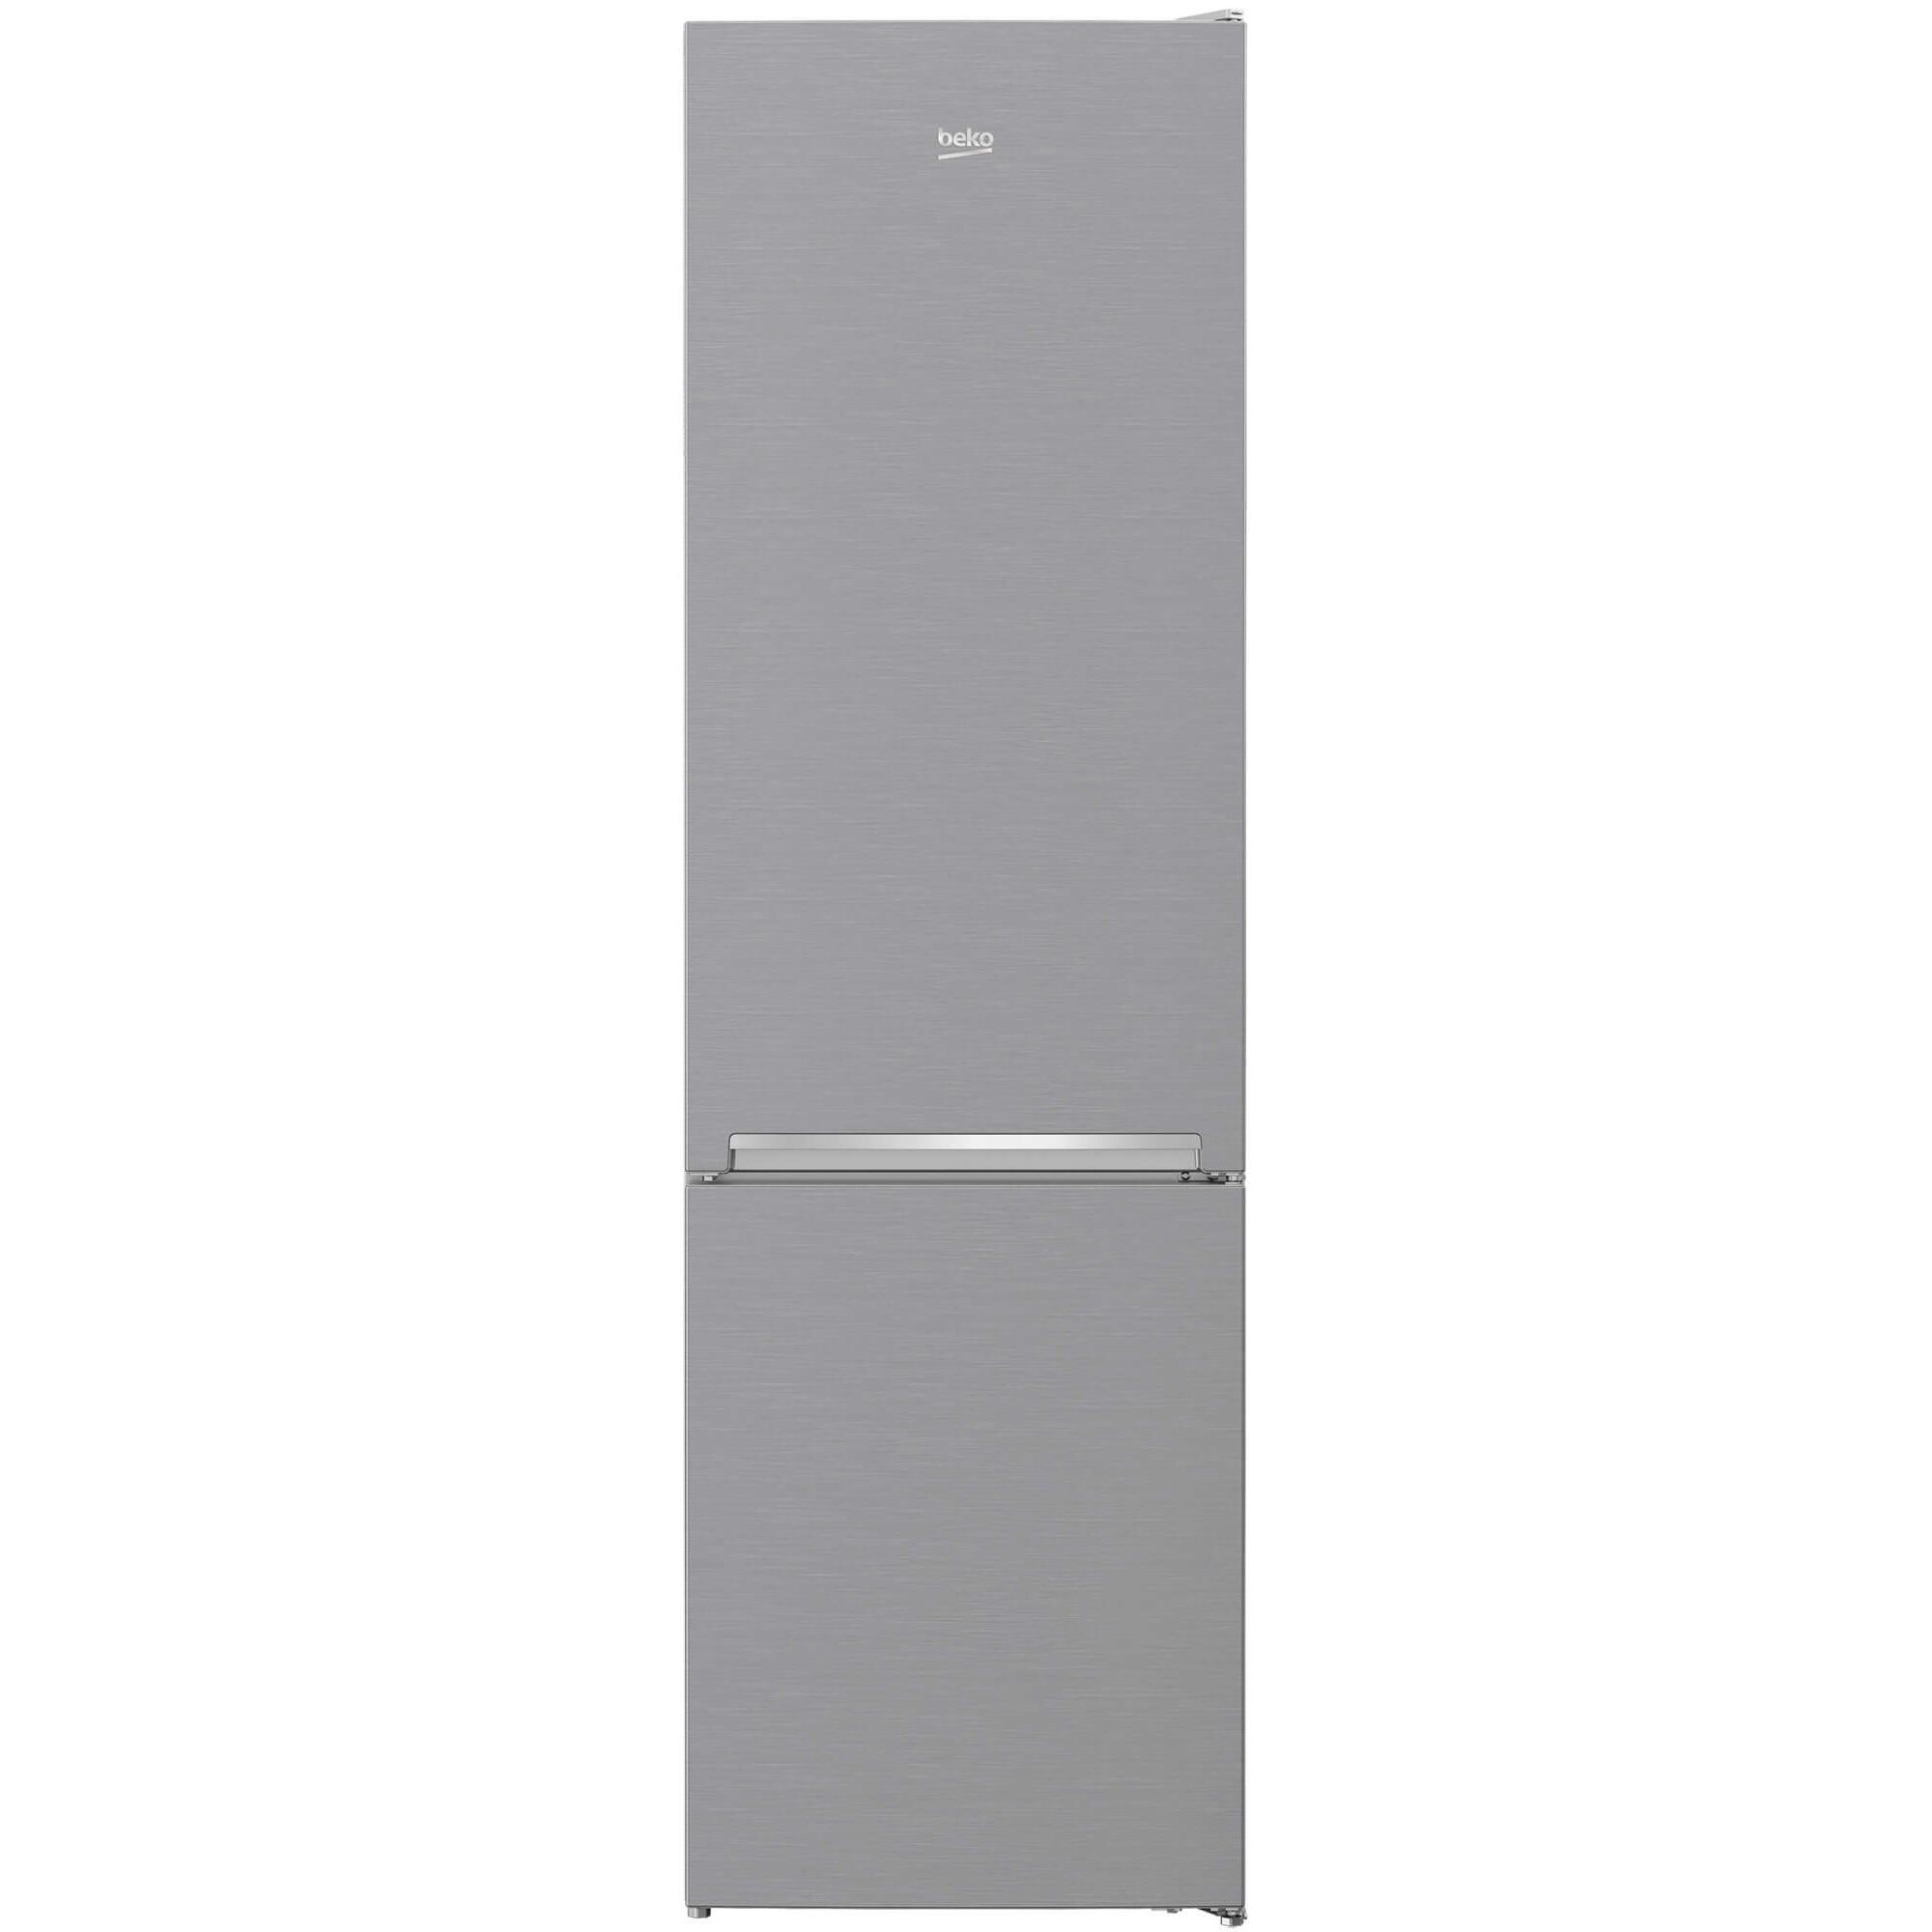 Fotografie Combina frigorifica Beko RCNA406I30XB, 362L, Touch control, No Frost, Clasa A++, H 203 cm, Argintiu